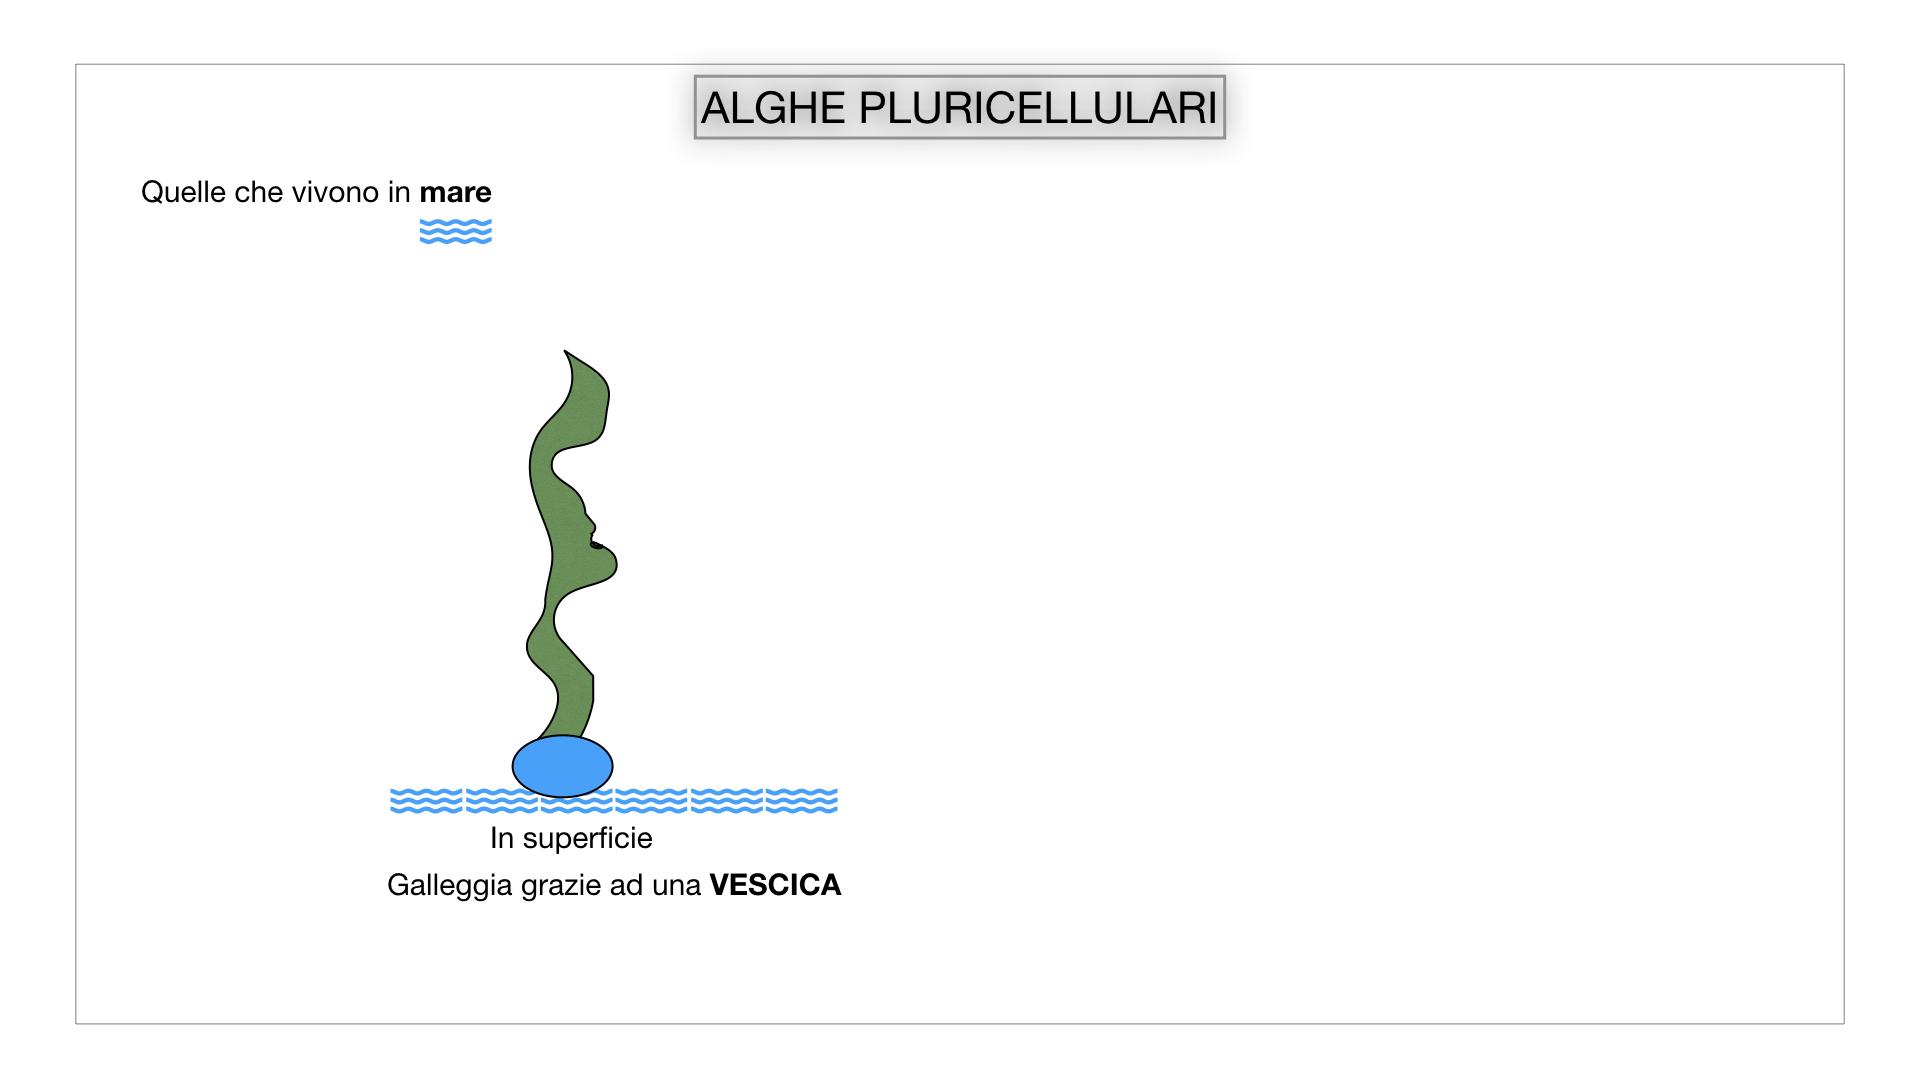 8. alghe uni_pluri_cellulari_SIMULAZIONE.033